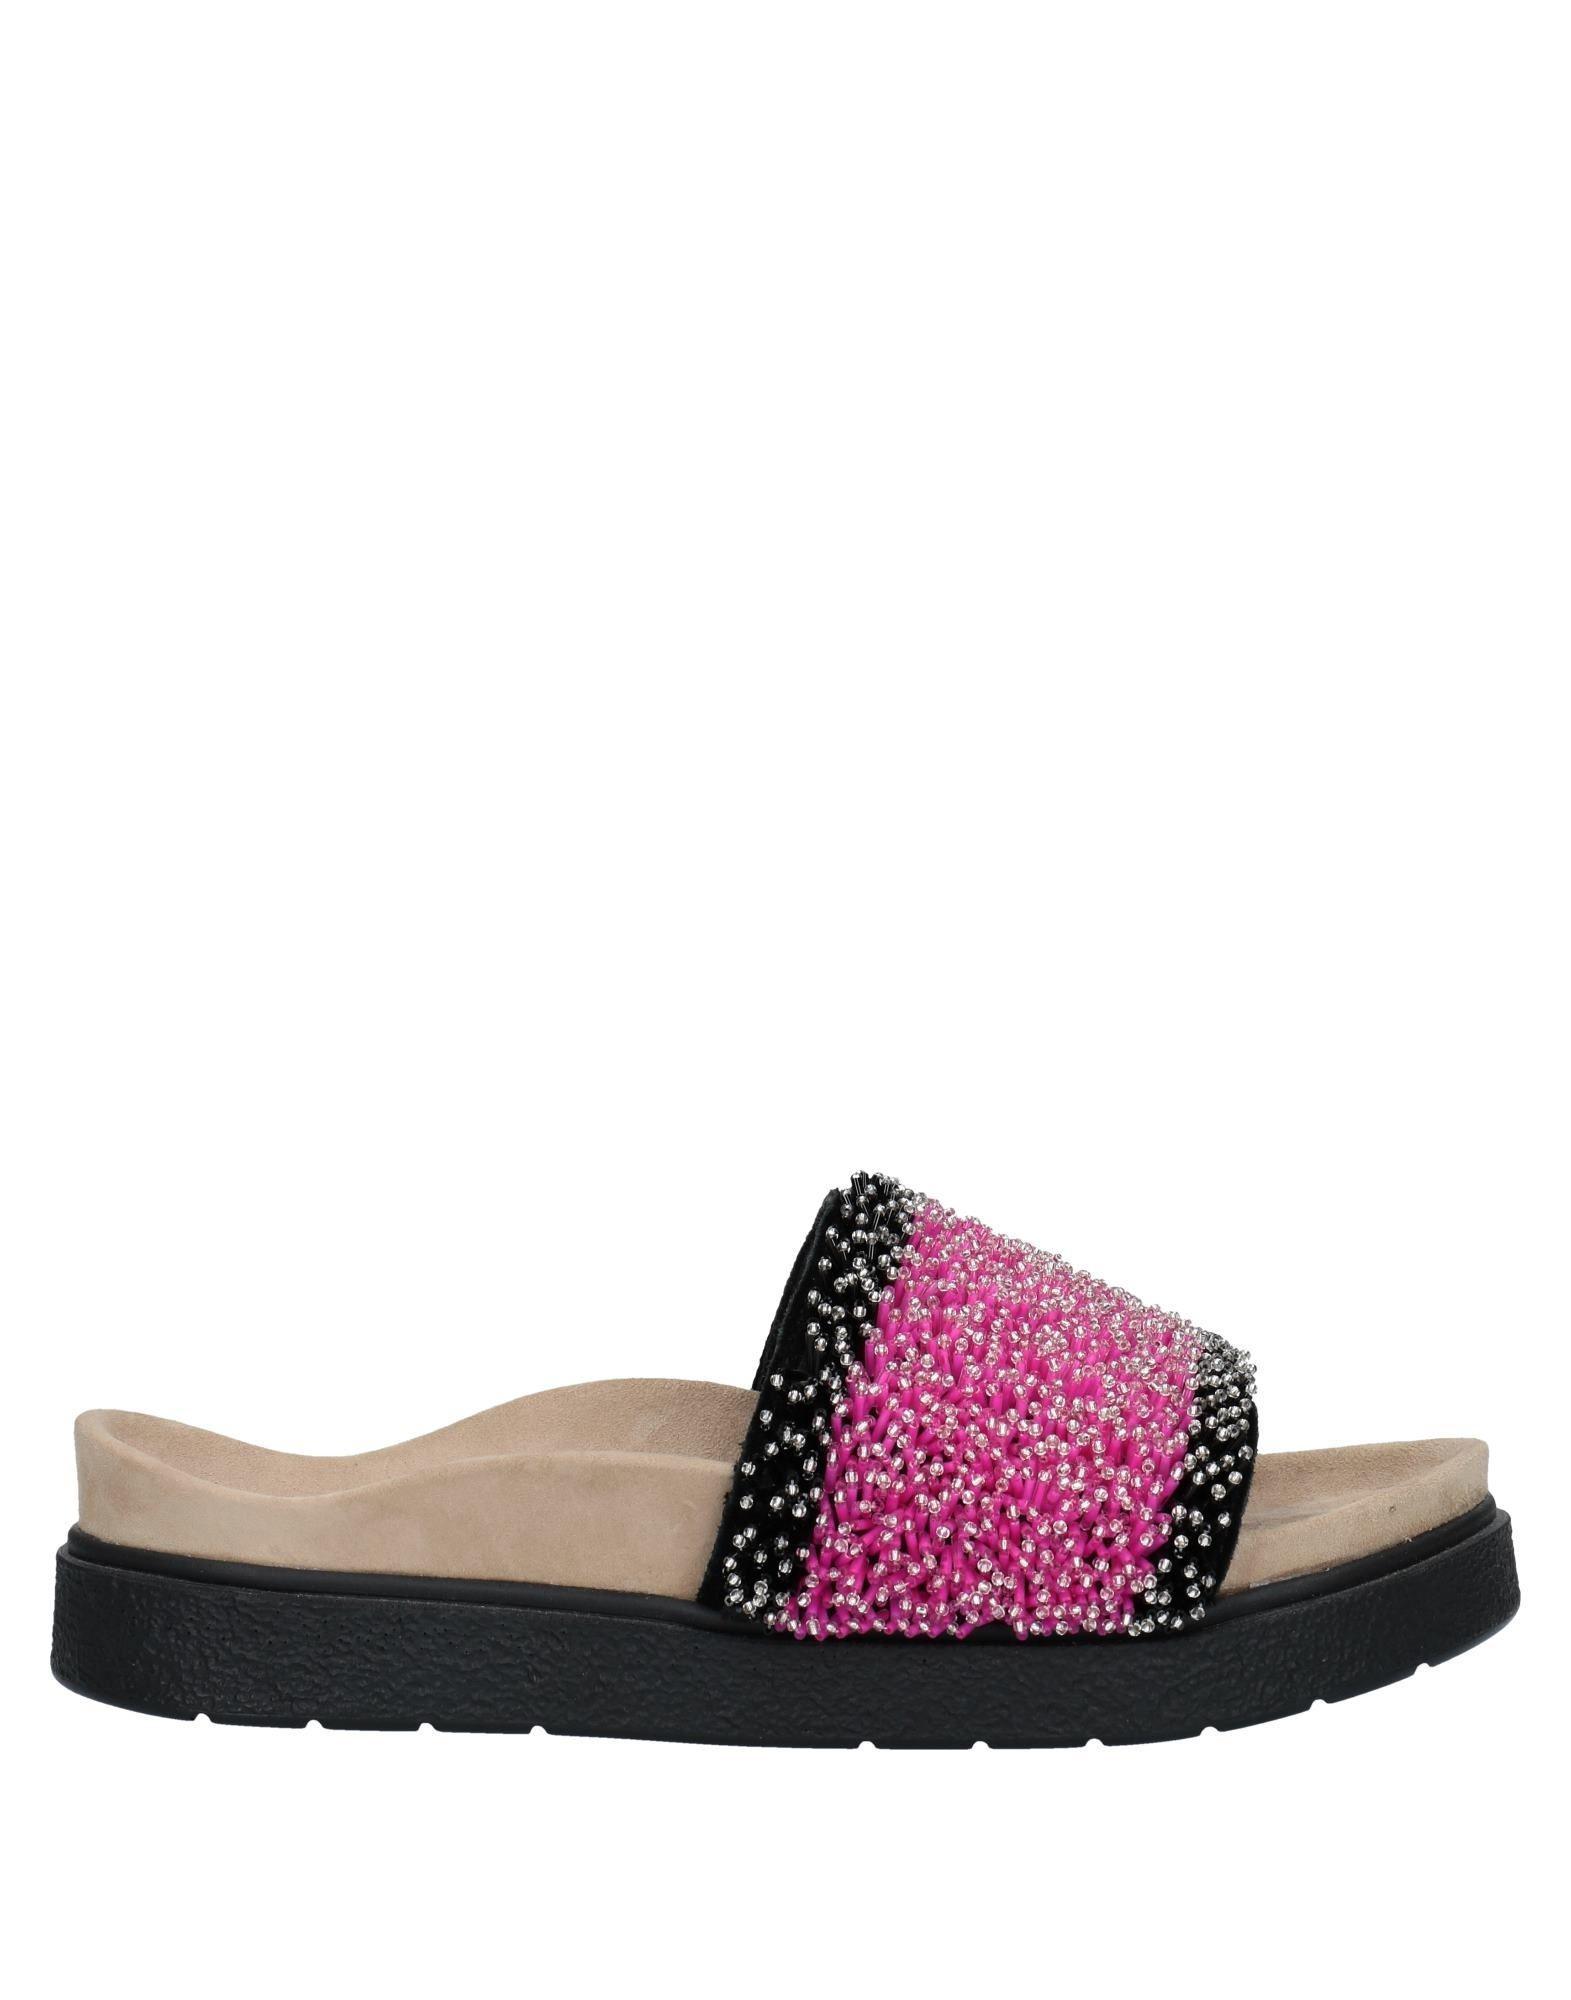 Sandals Inuikii Purple In Purple In Inuikii Lyst Sandals Inuikii Lyst In Sandals w16wxq8